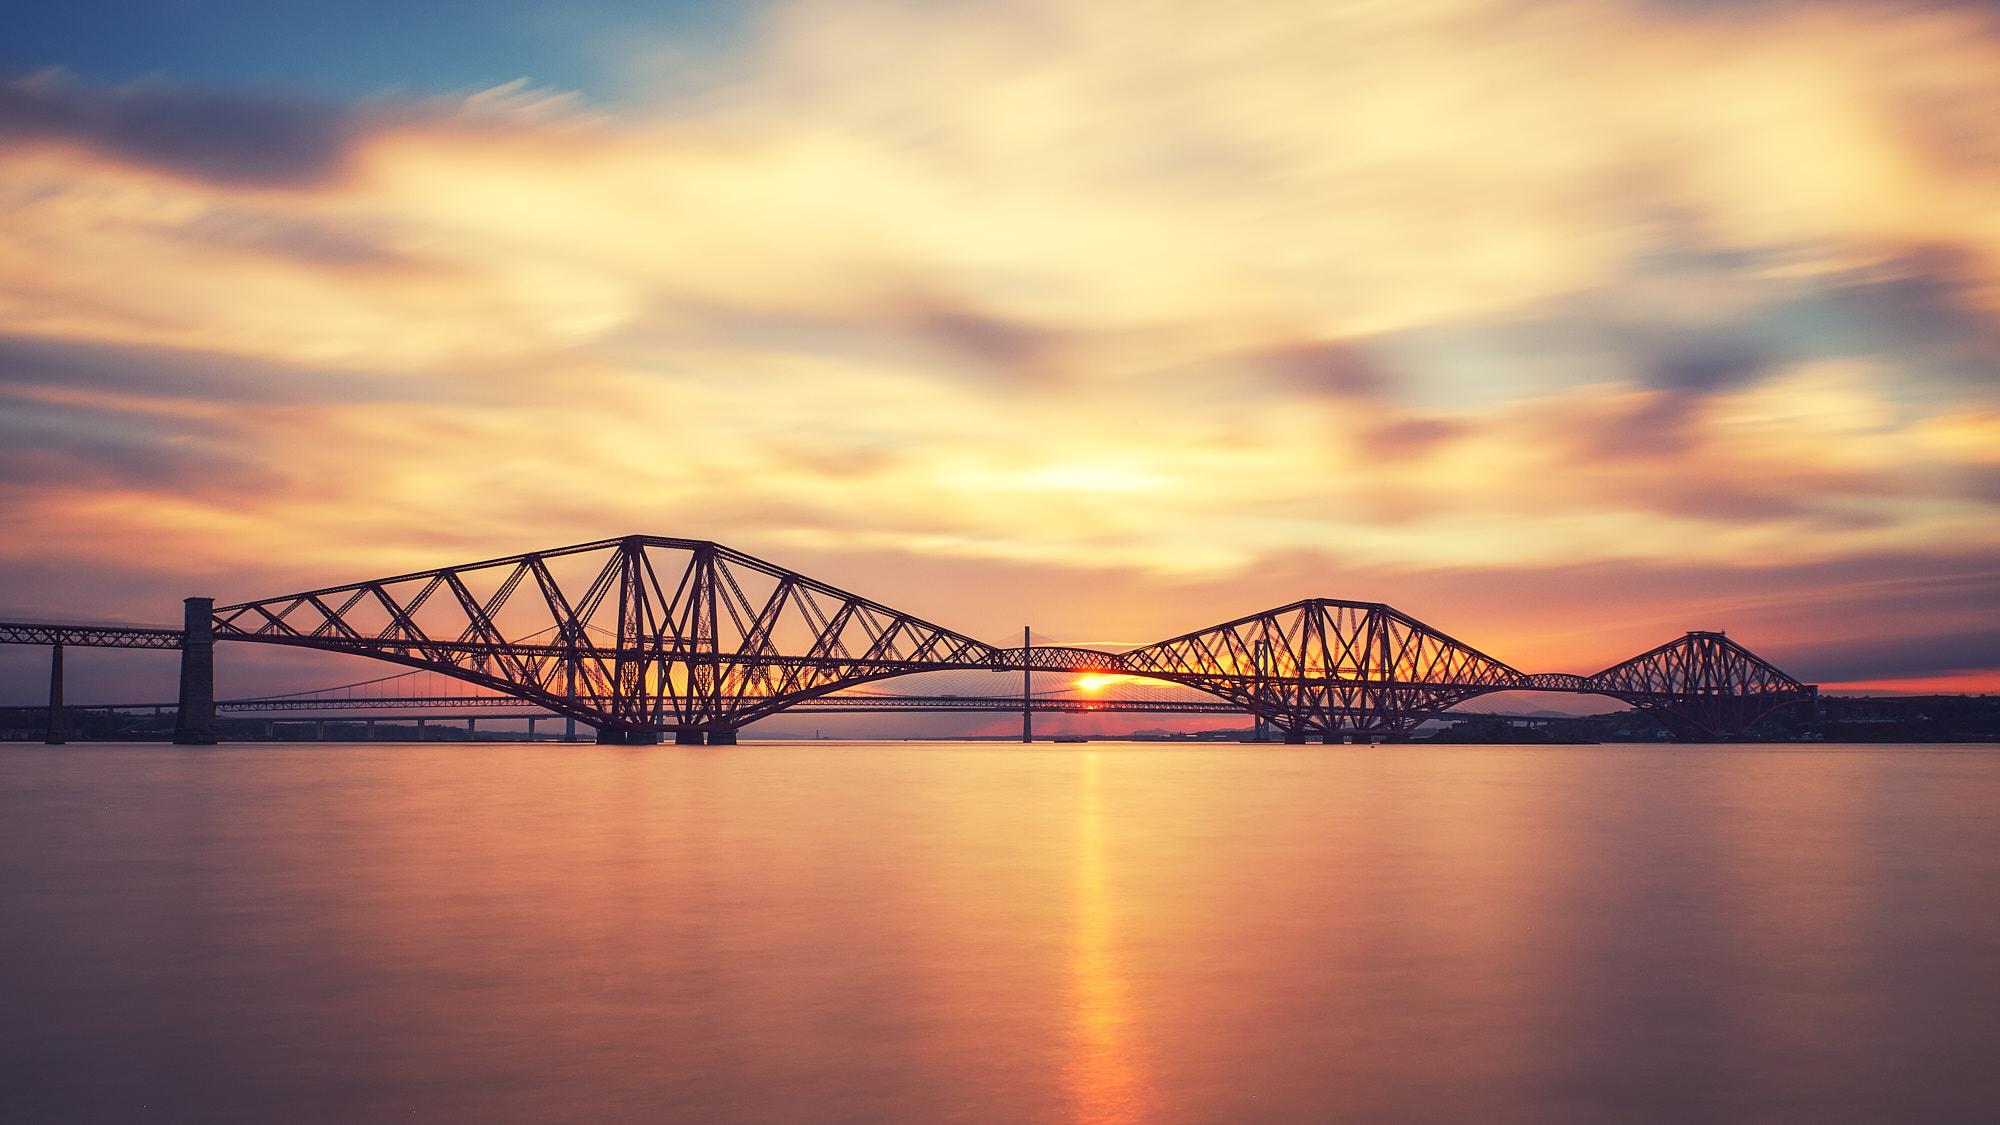 The Bridges, Sunday 06 May, 2018 in South Queensferry, Edinburgh, Scotland